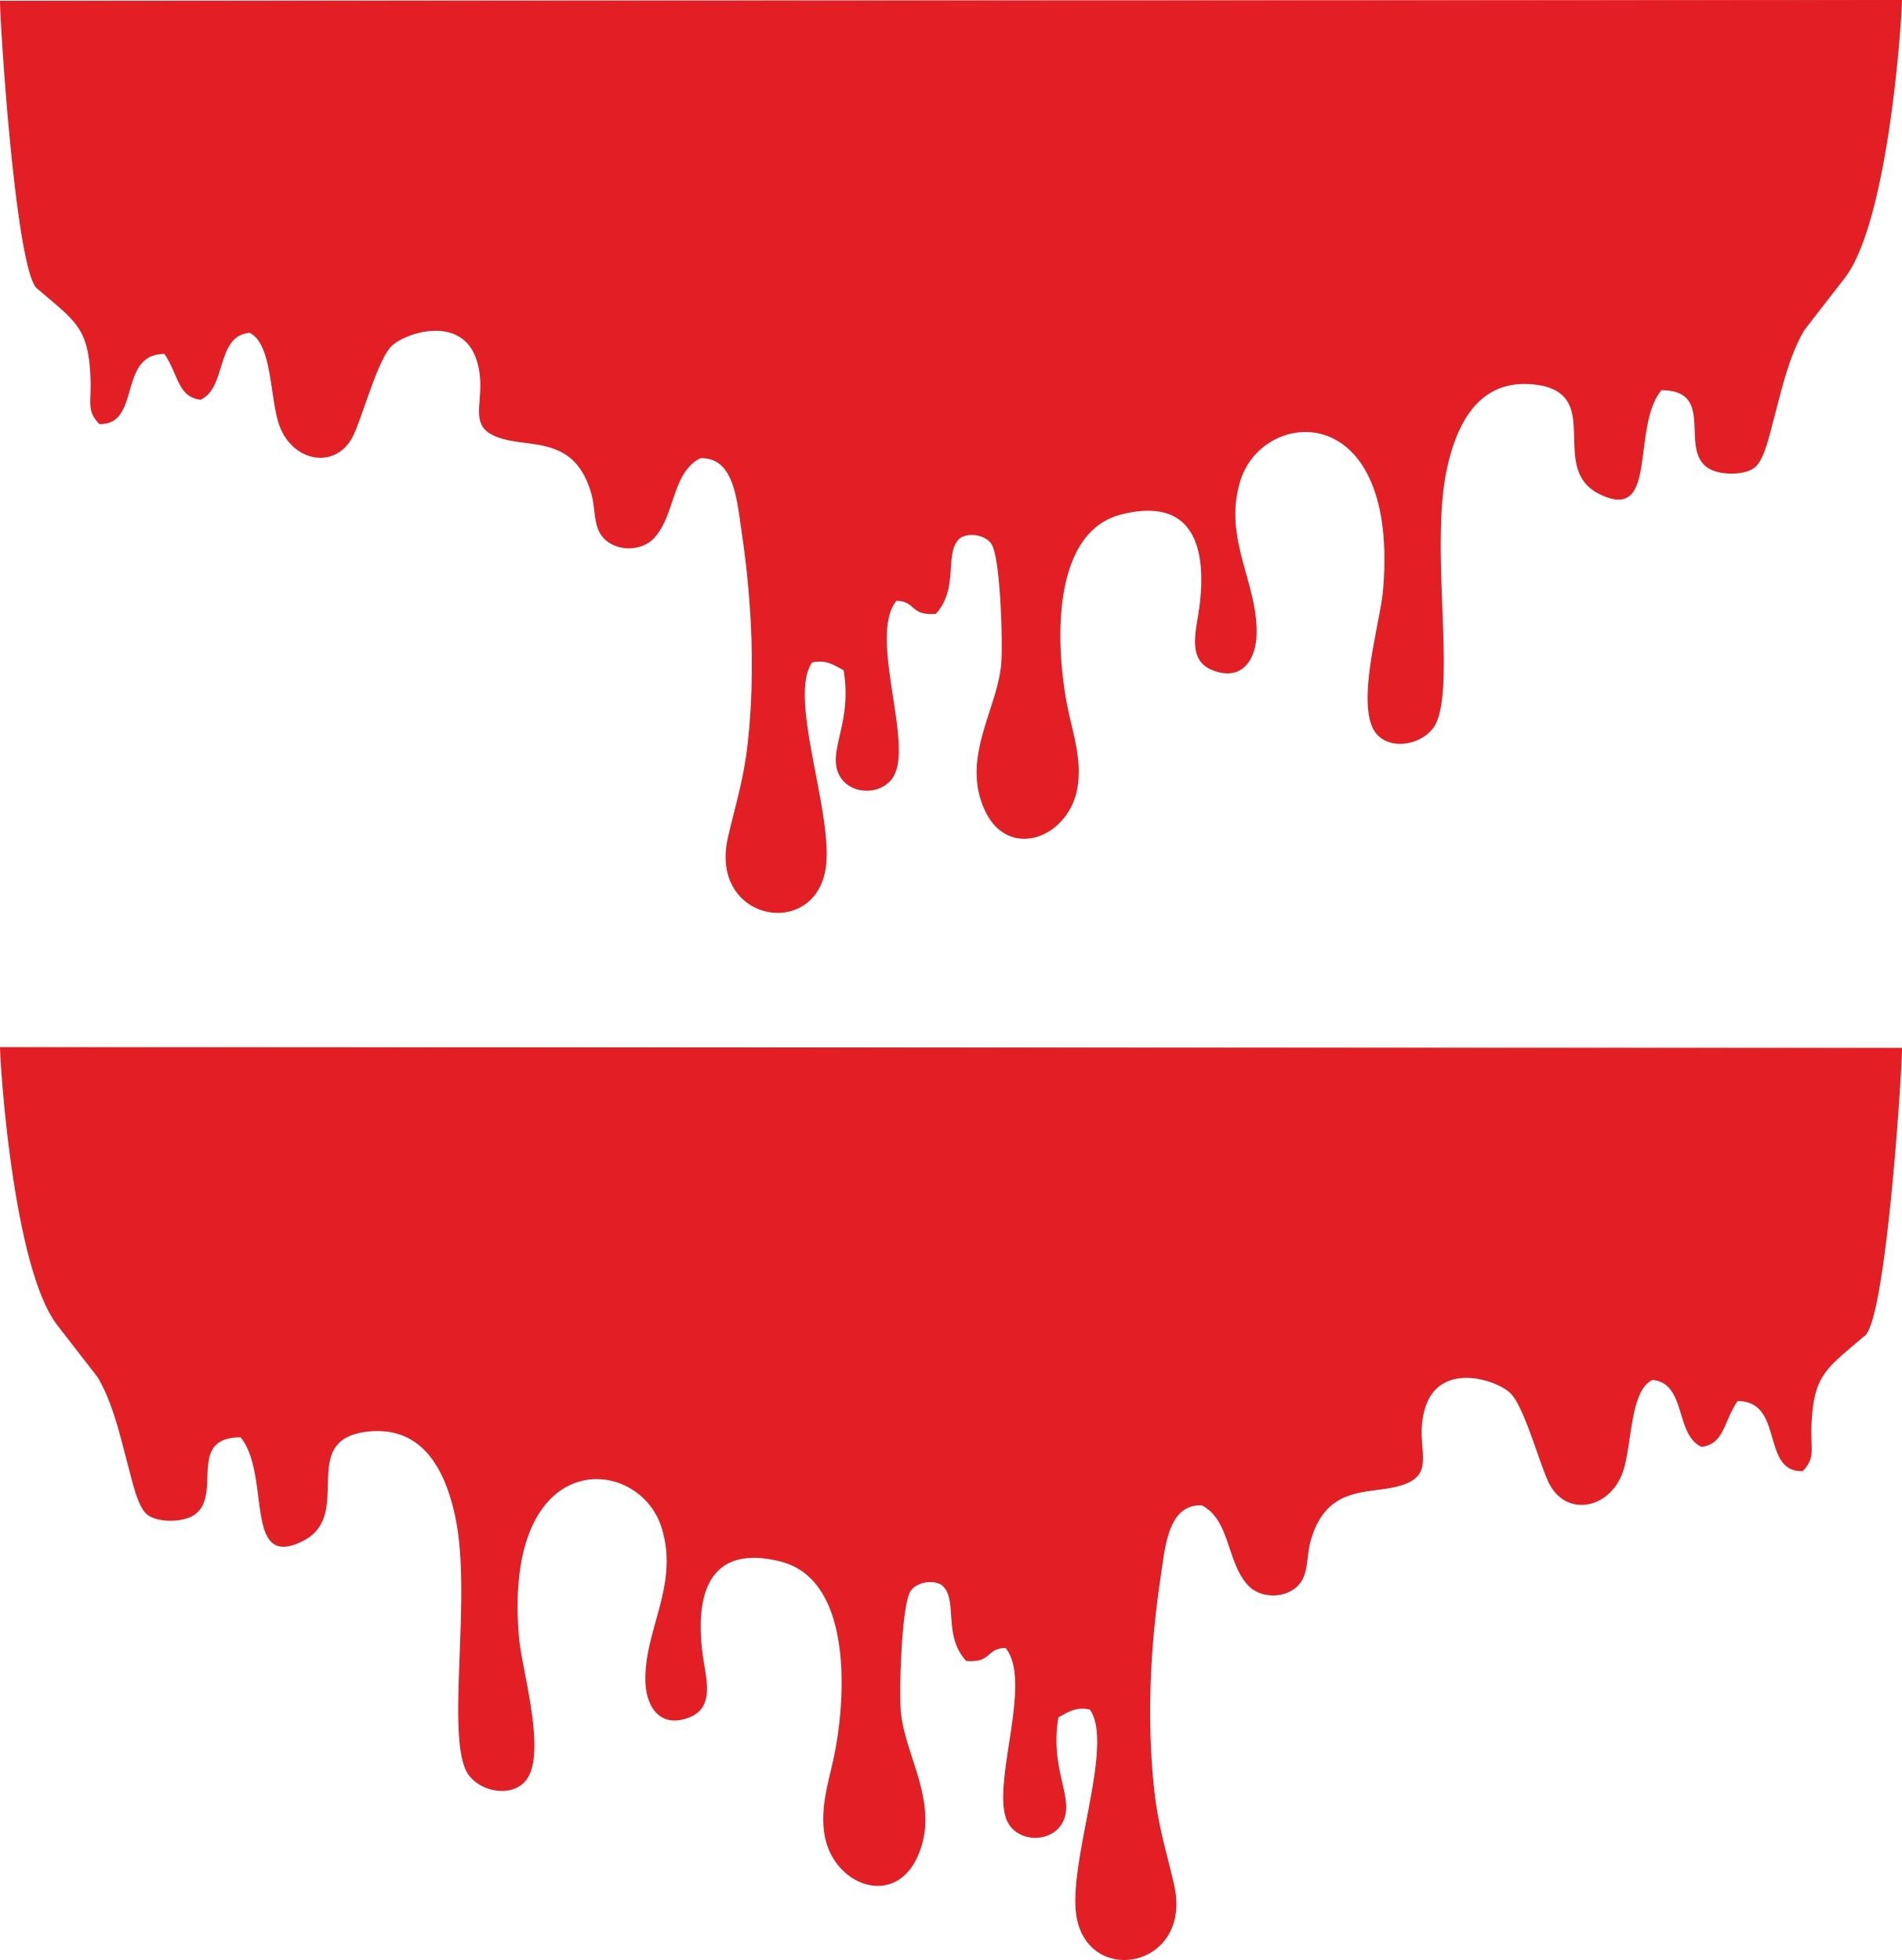 Aufkleber Blutstropfen appliziert 001